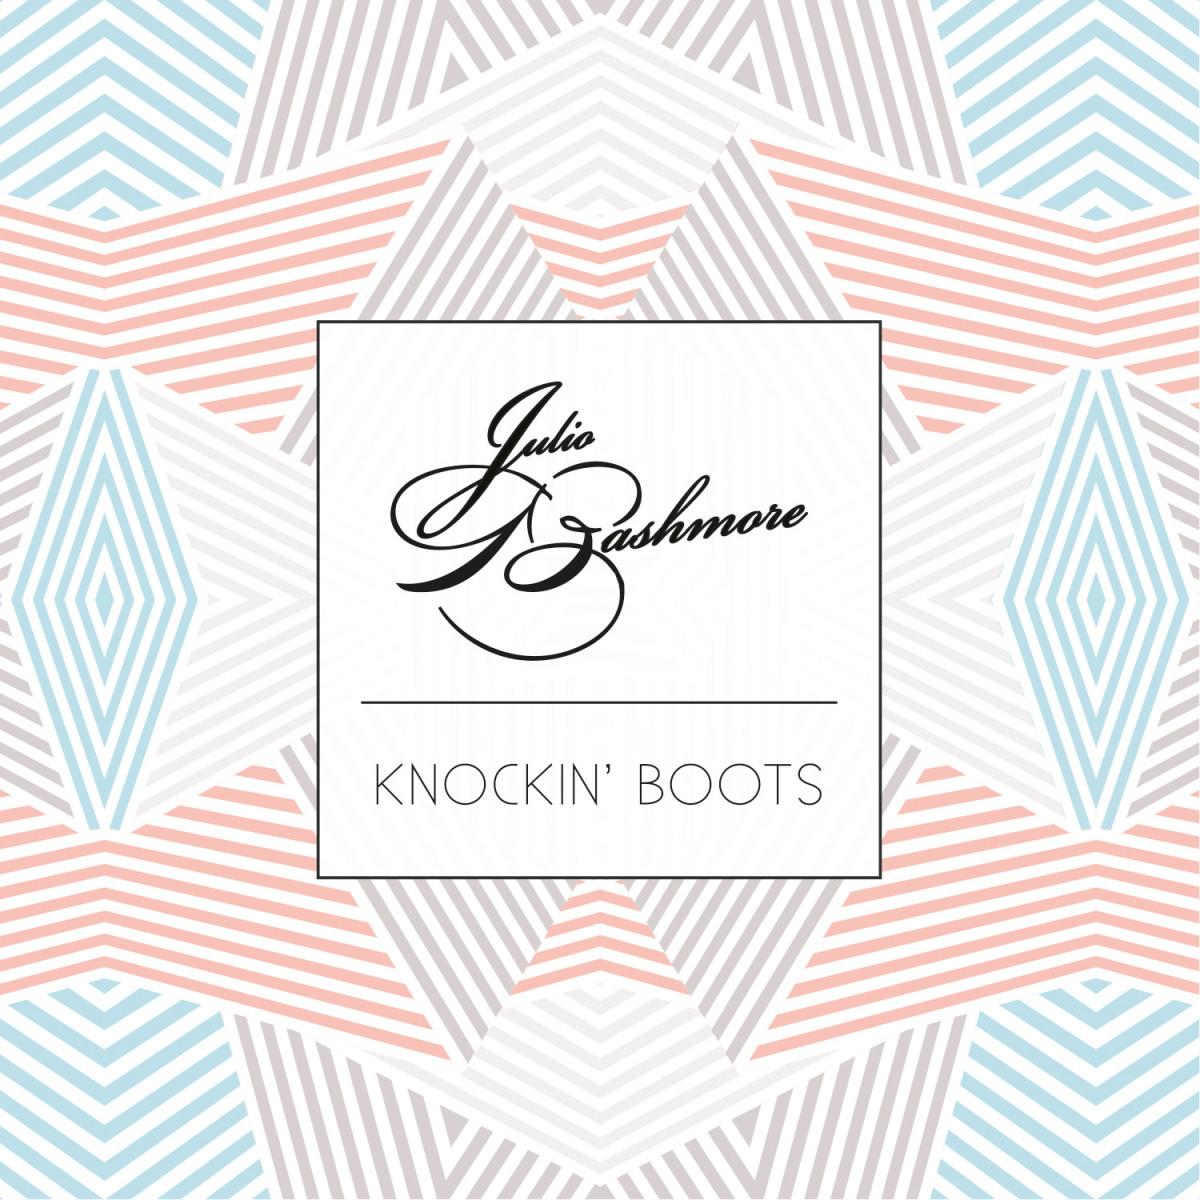 julio-bashmore-knockin-boots